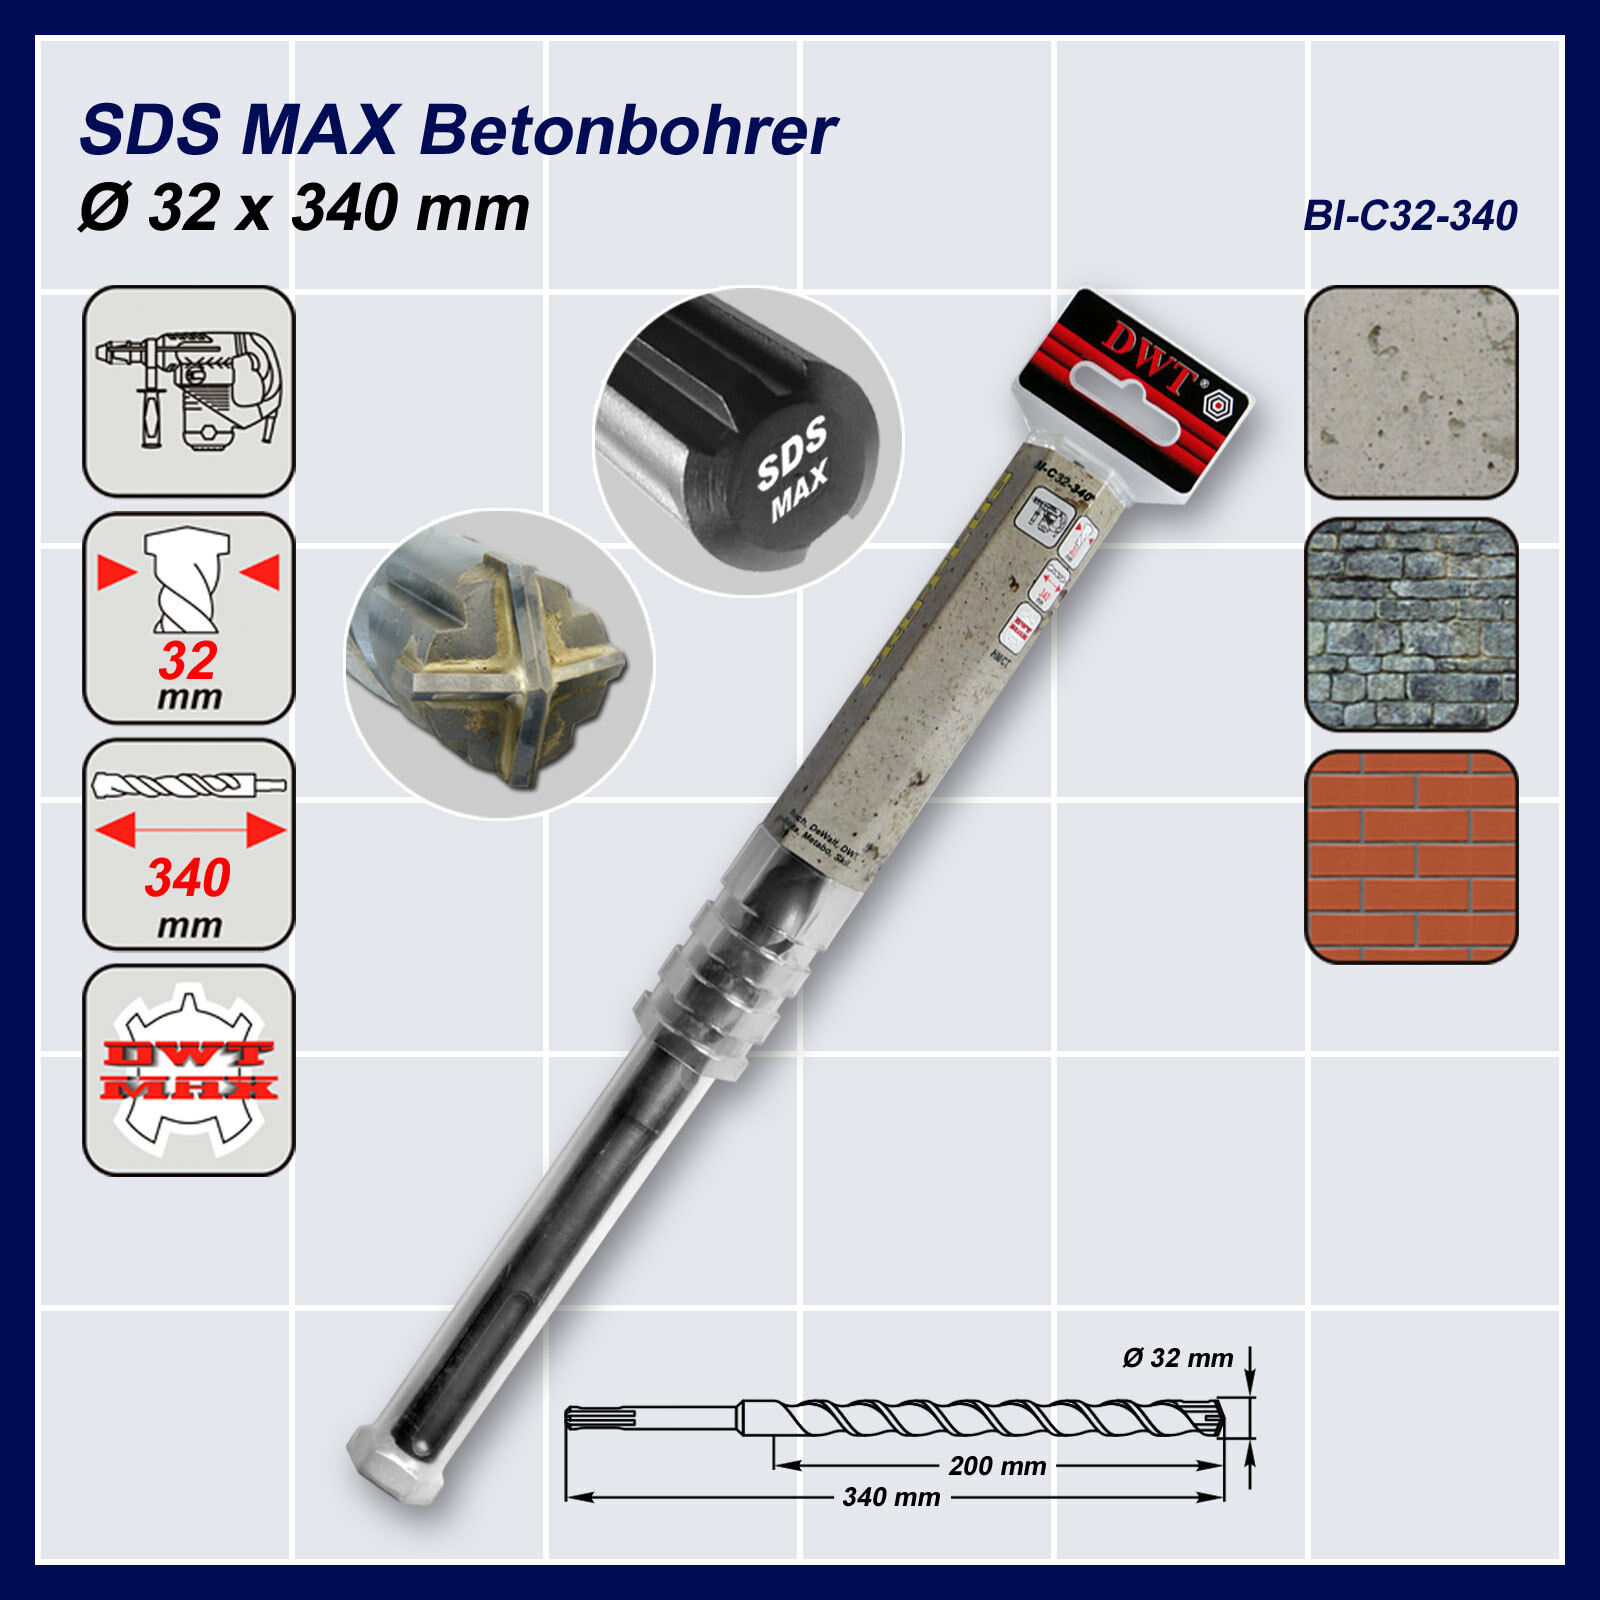 SDS MAX Hammerbohrer Betonbohrer Kreuzschneide Ø 32 x 340-540-920 mm zur Auswahl